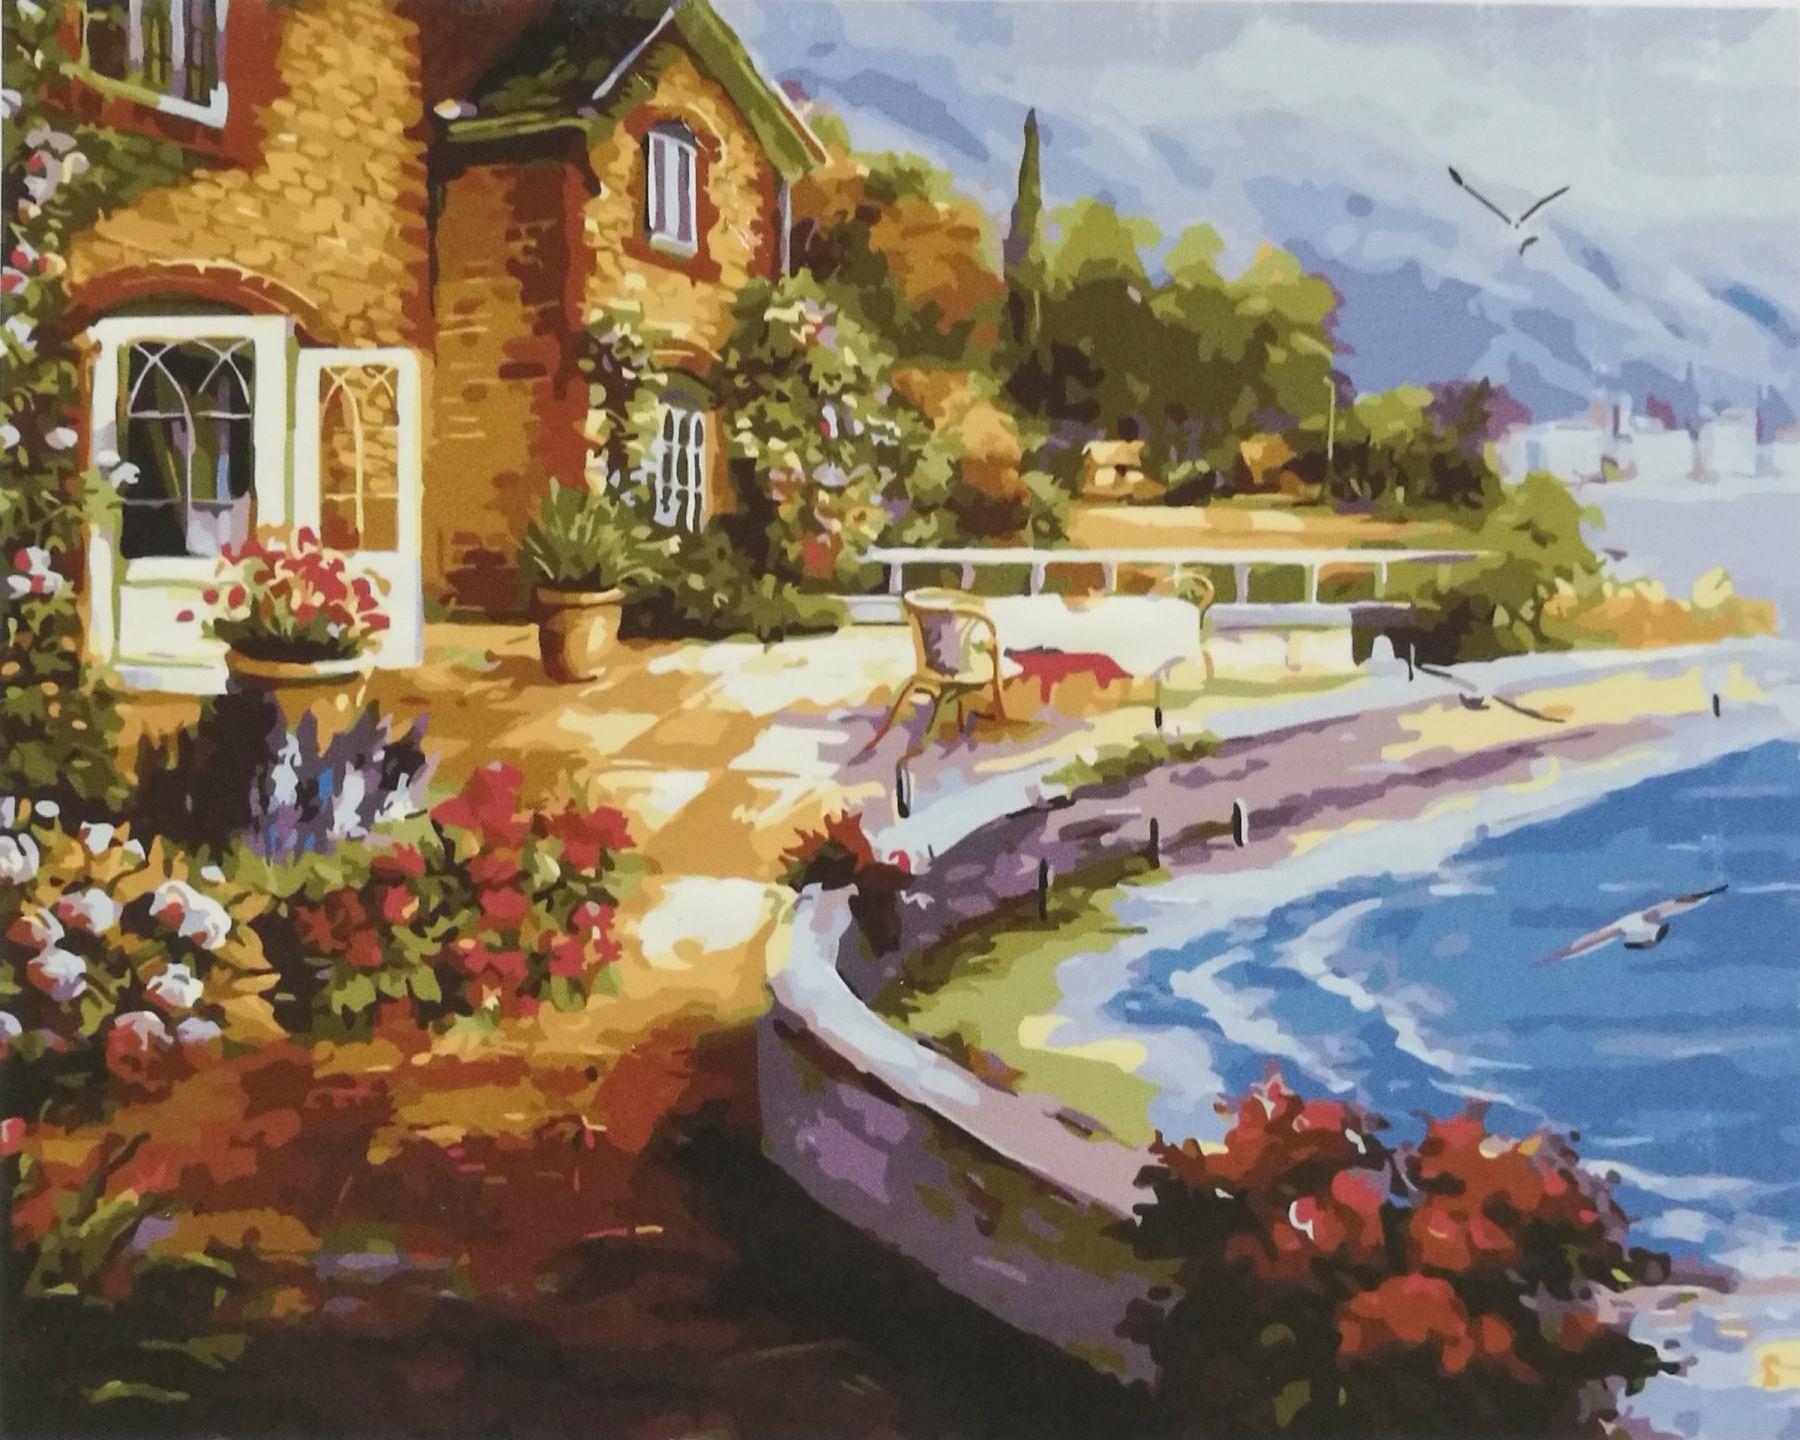 Картина по номерам GX 36468 Цветочный берег 40х50